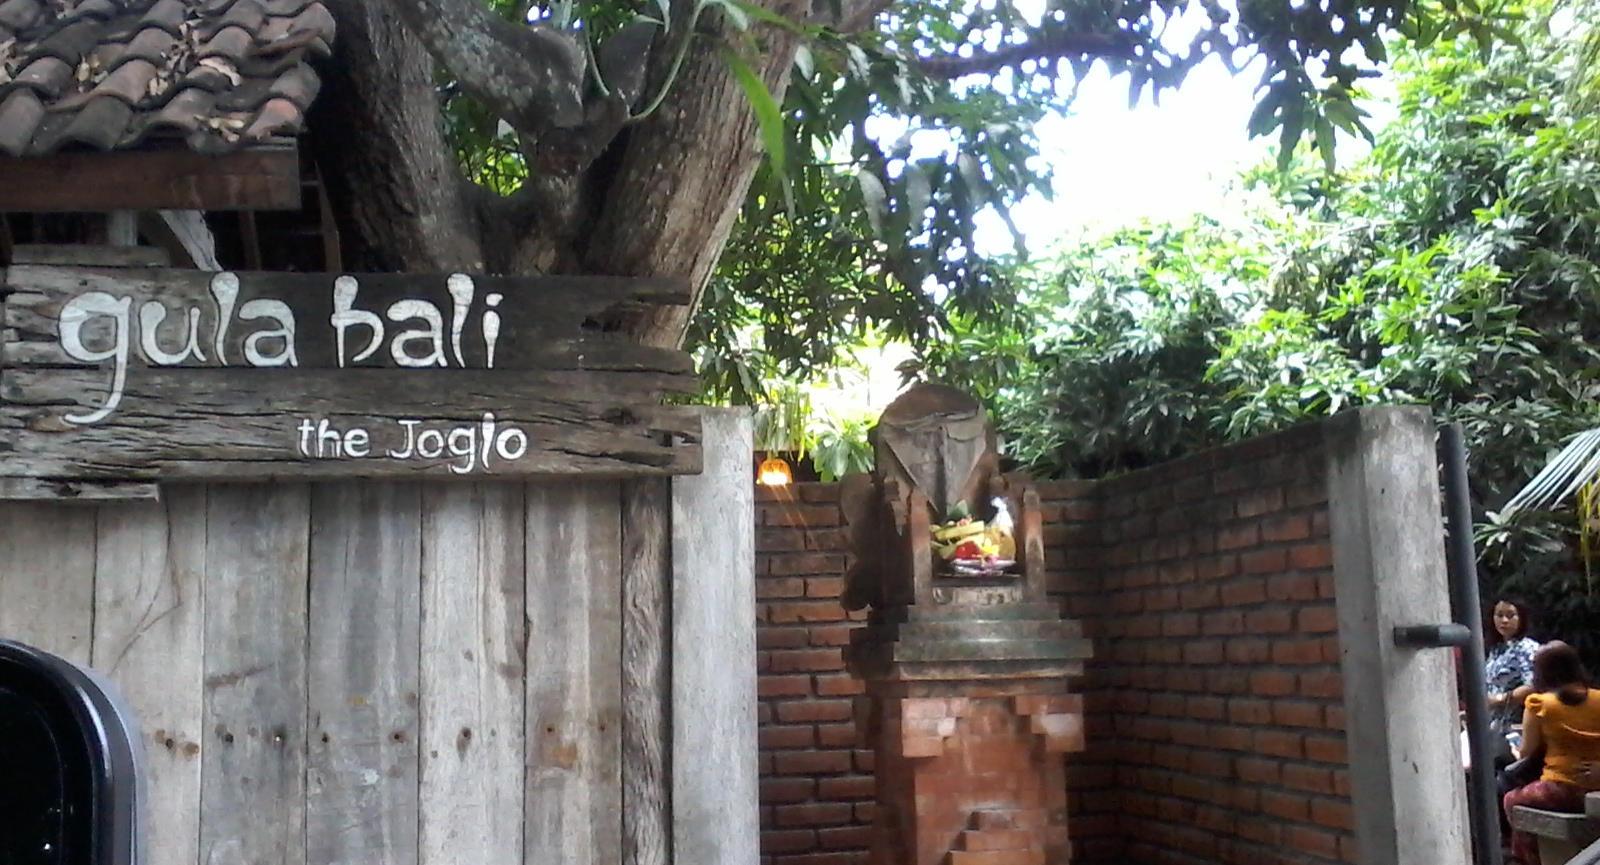 Gula Bali The Joglo: Get A Taste Of All Balinese Cuisine In One Spot!